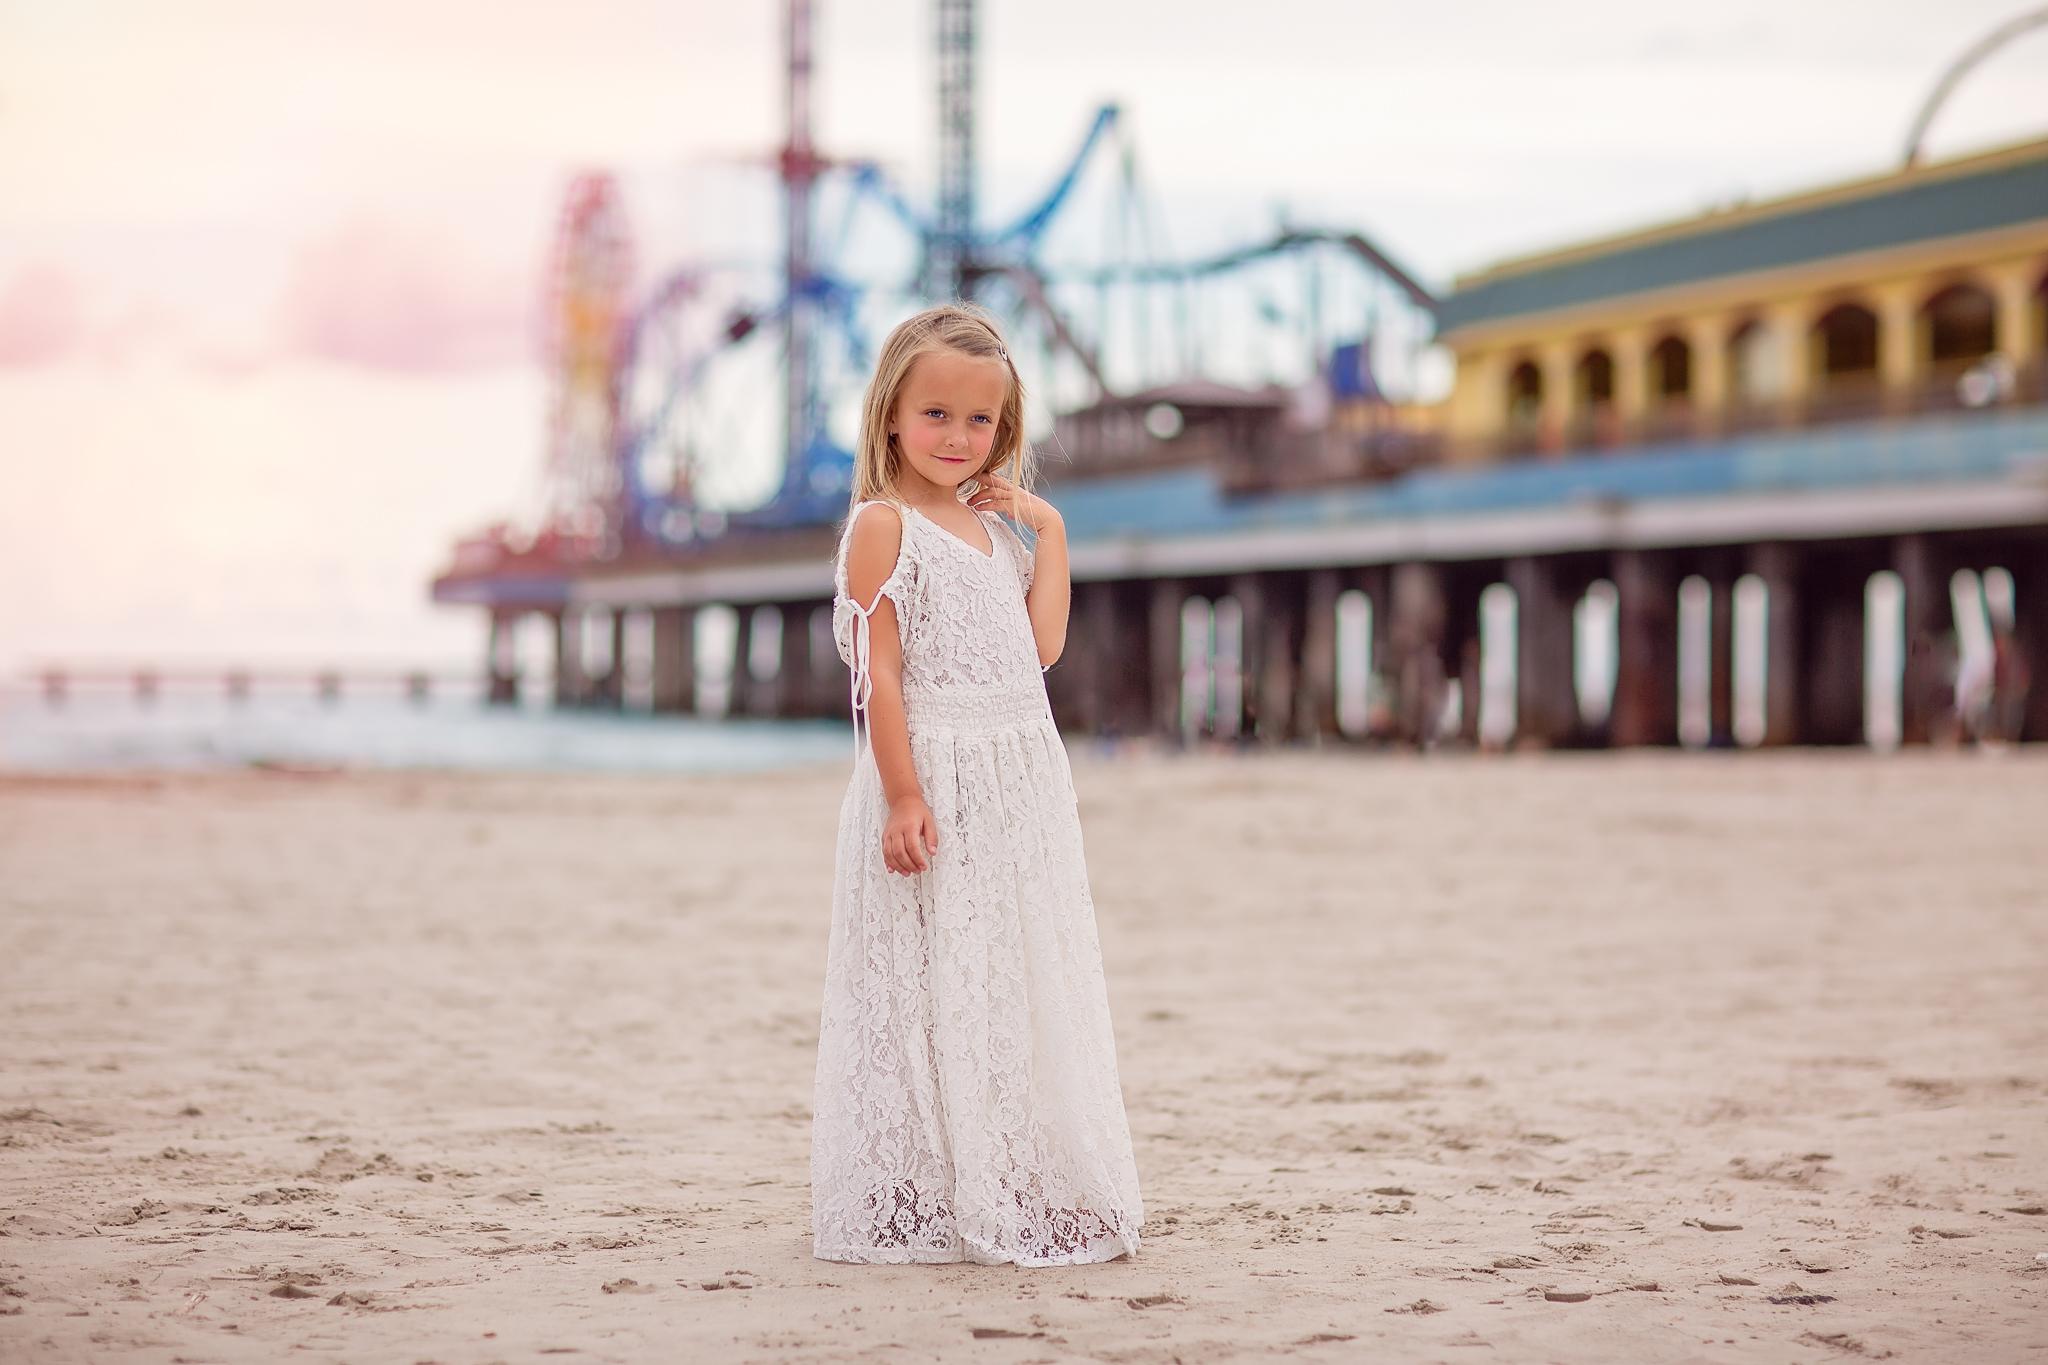 galveston-beach-childrens-portrait-photographer-sugar-land-katy-houston-family-photography.jpg